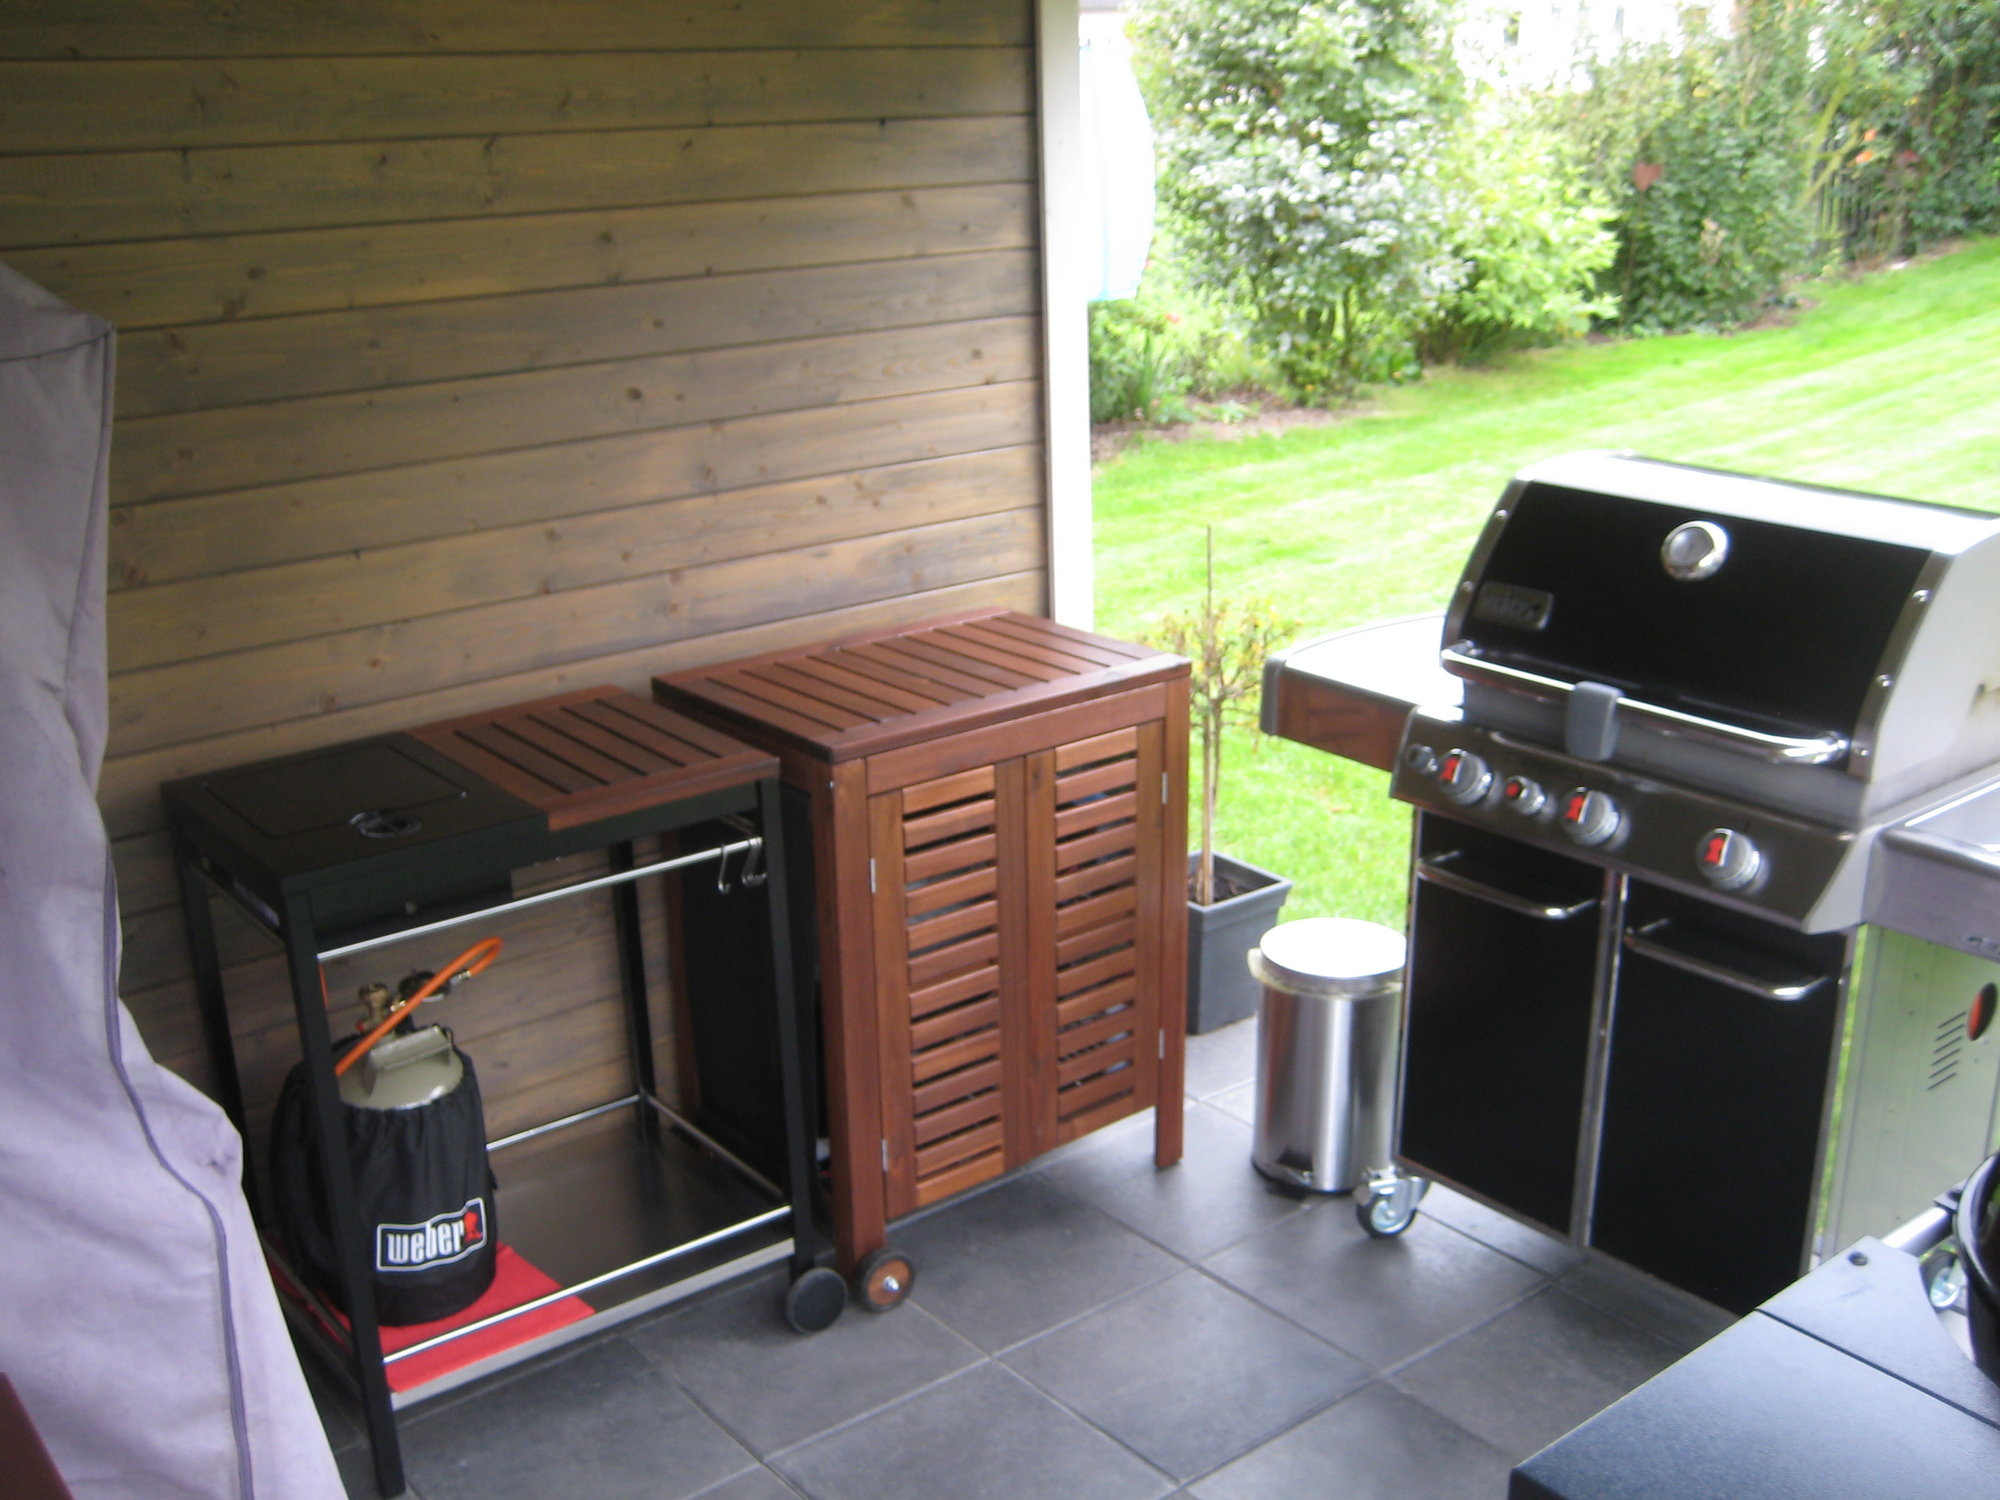 Erfreut Home Depot Außenküche Fotos - Küche Set Ideen ...